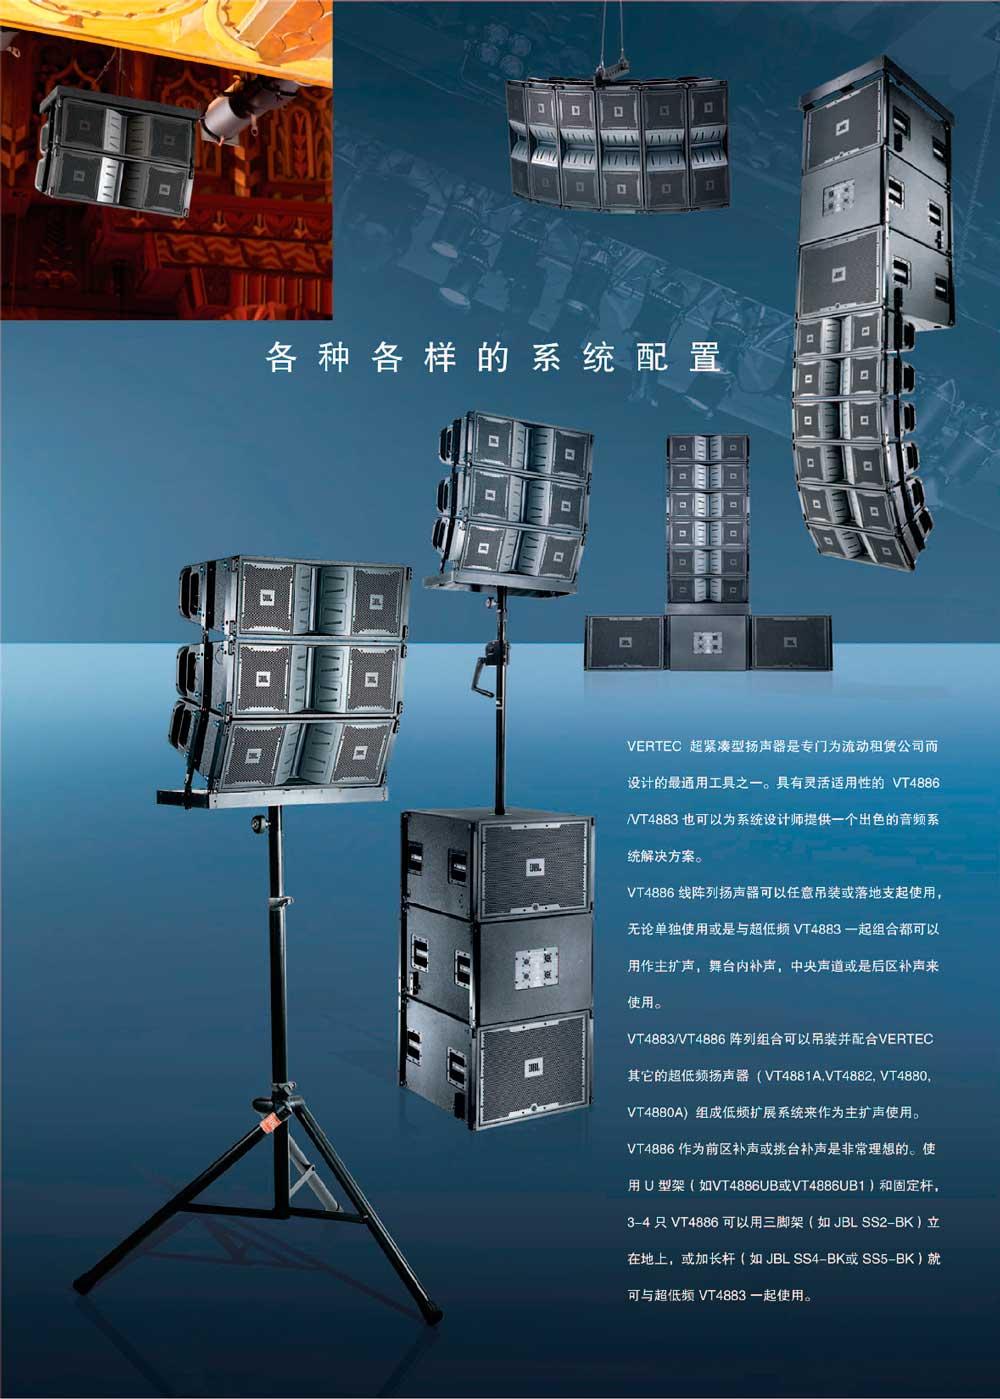 jbl vt4886三分频线阵列扬声器